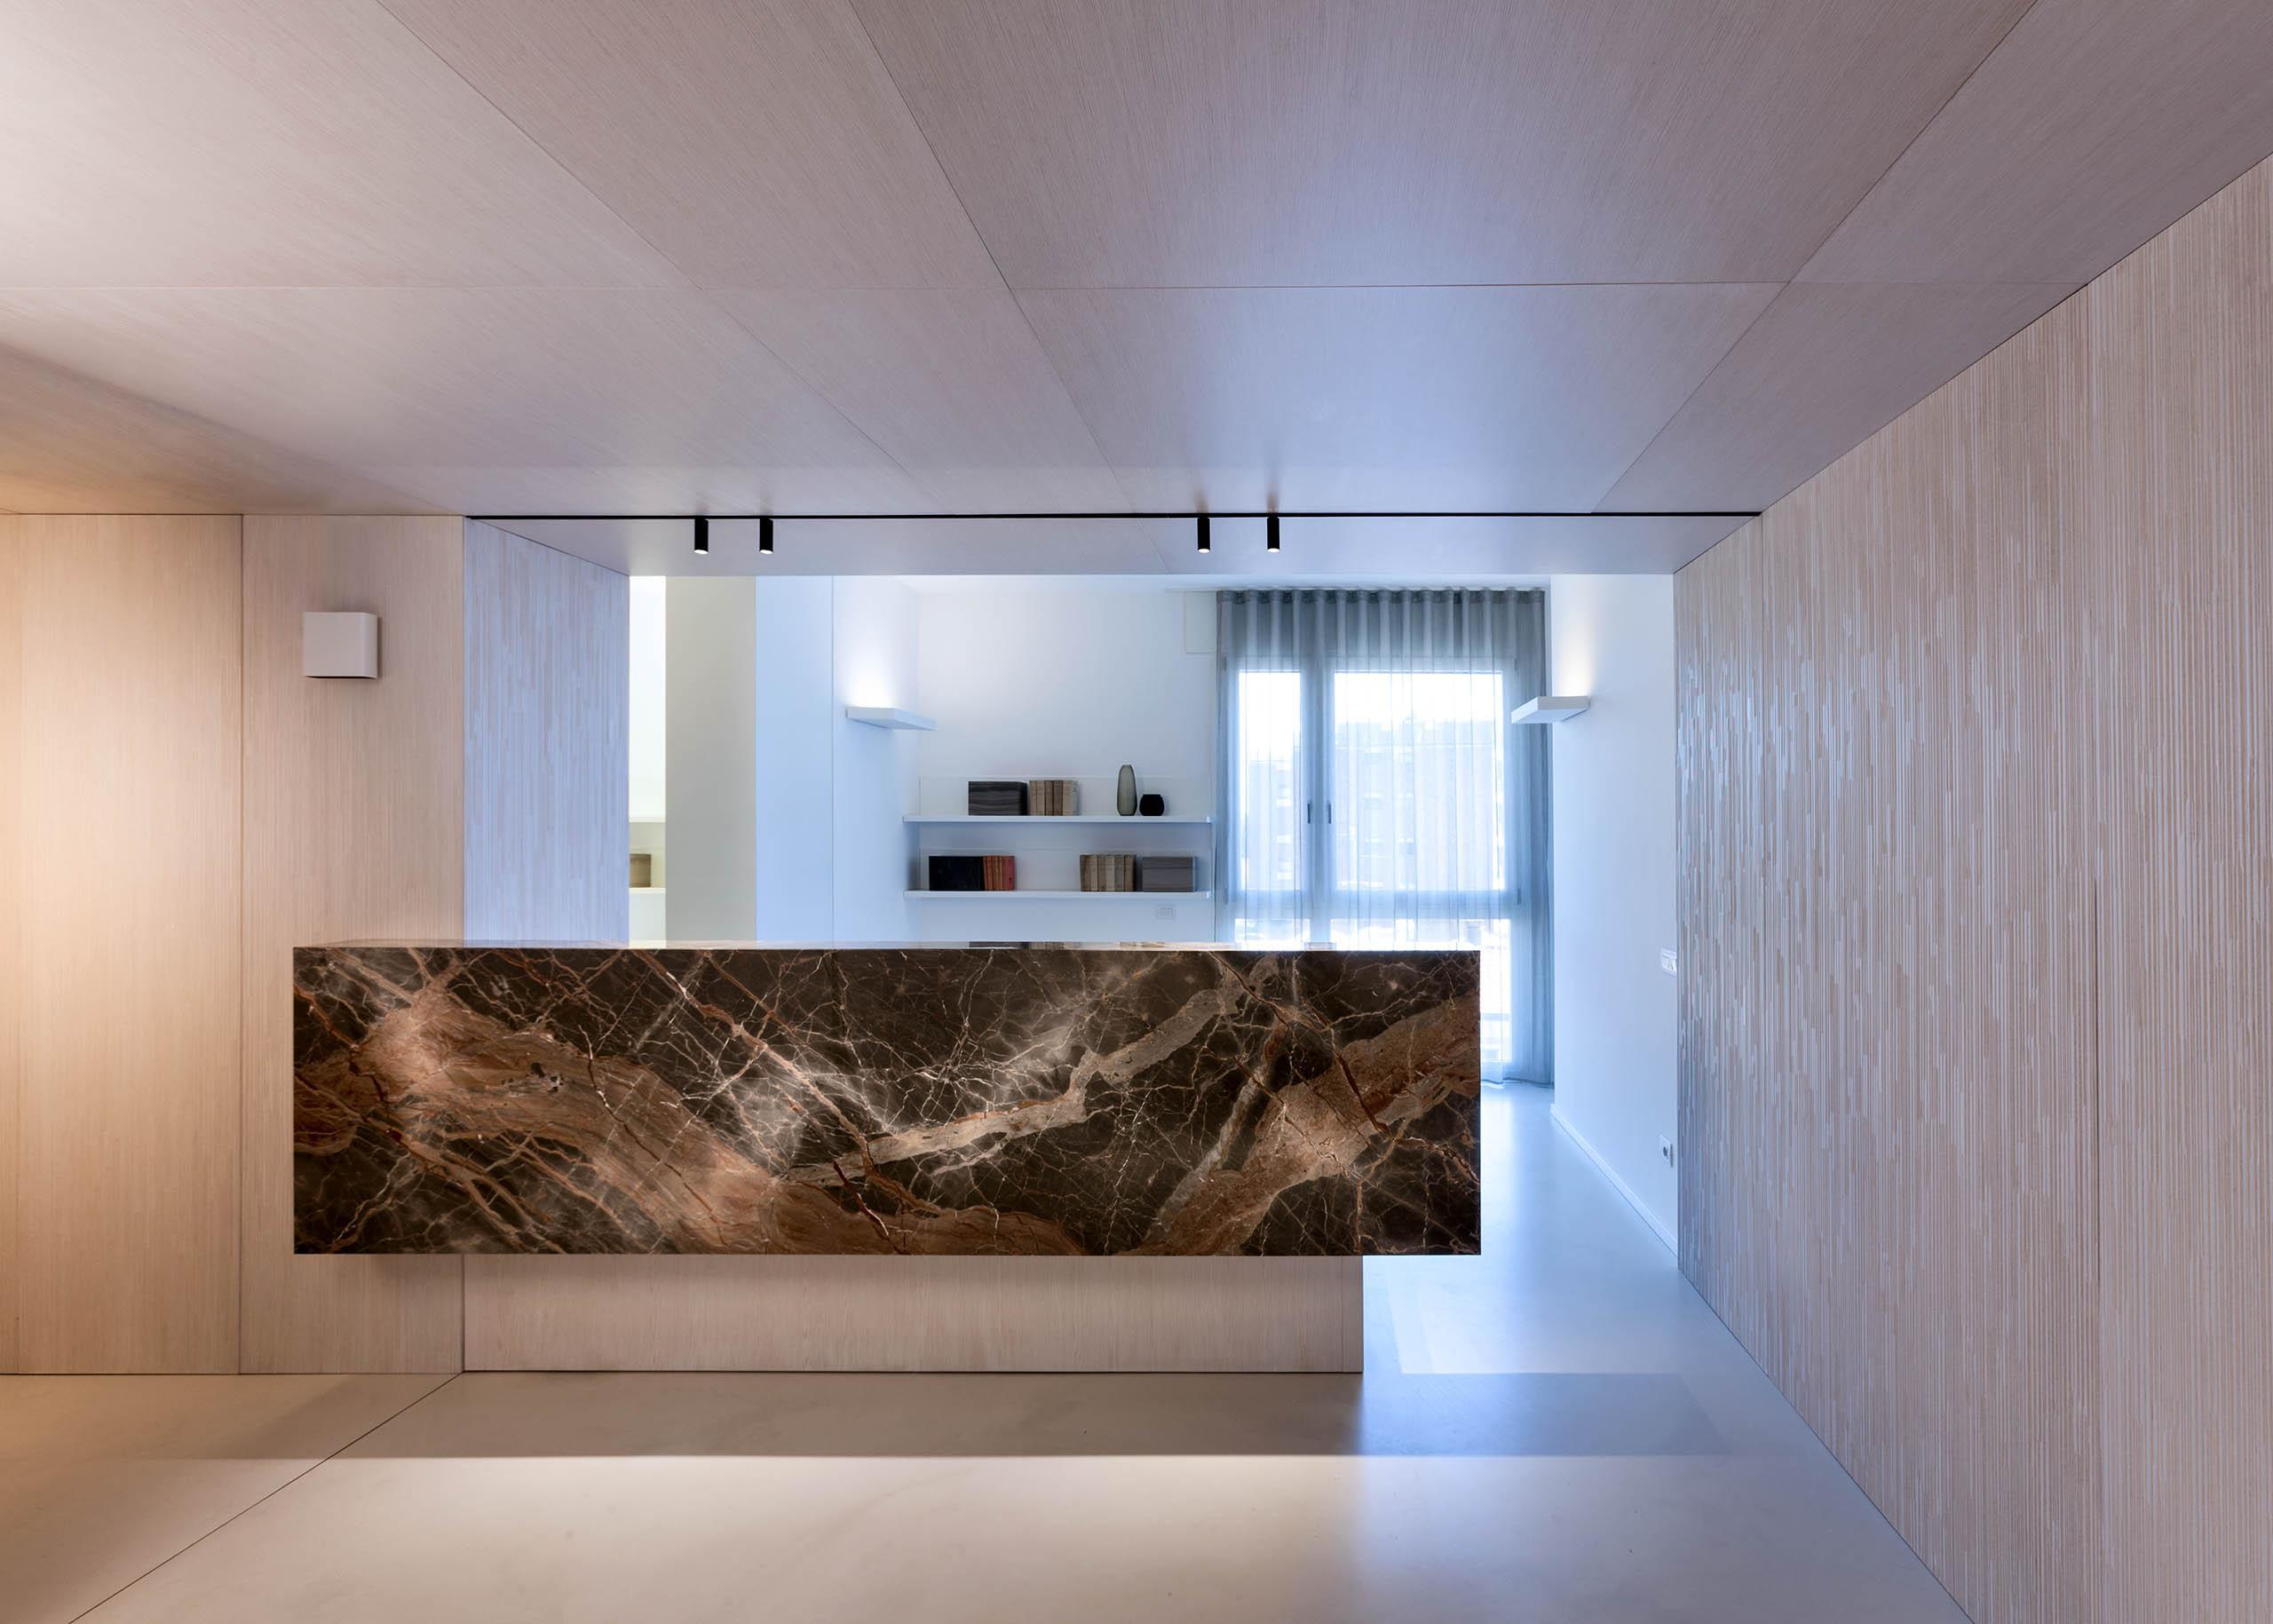 Modern interior design for luxury office reception desk, waiting room, hallway, corporate office